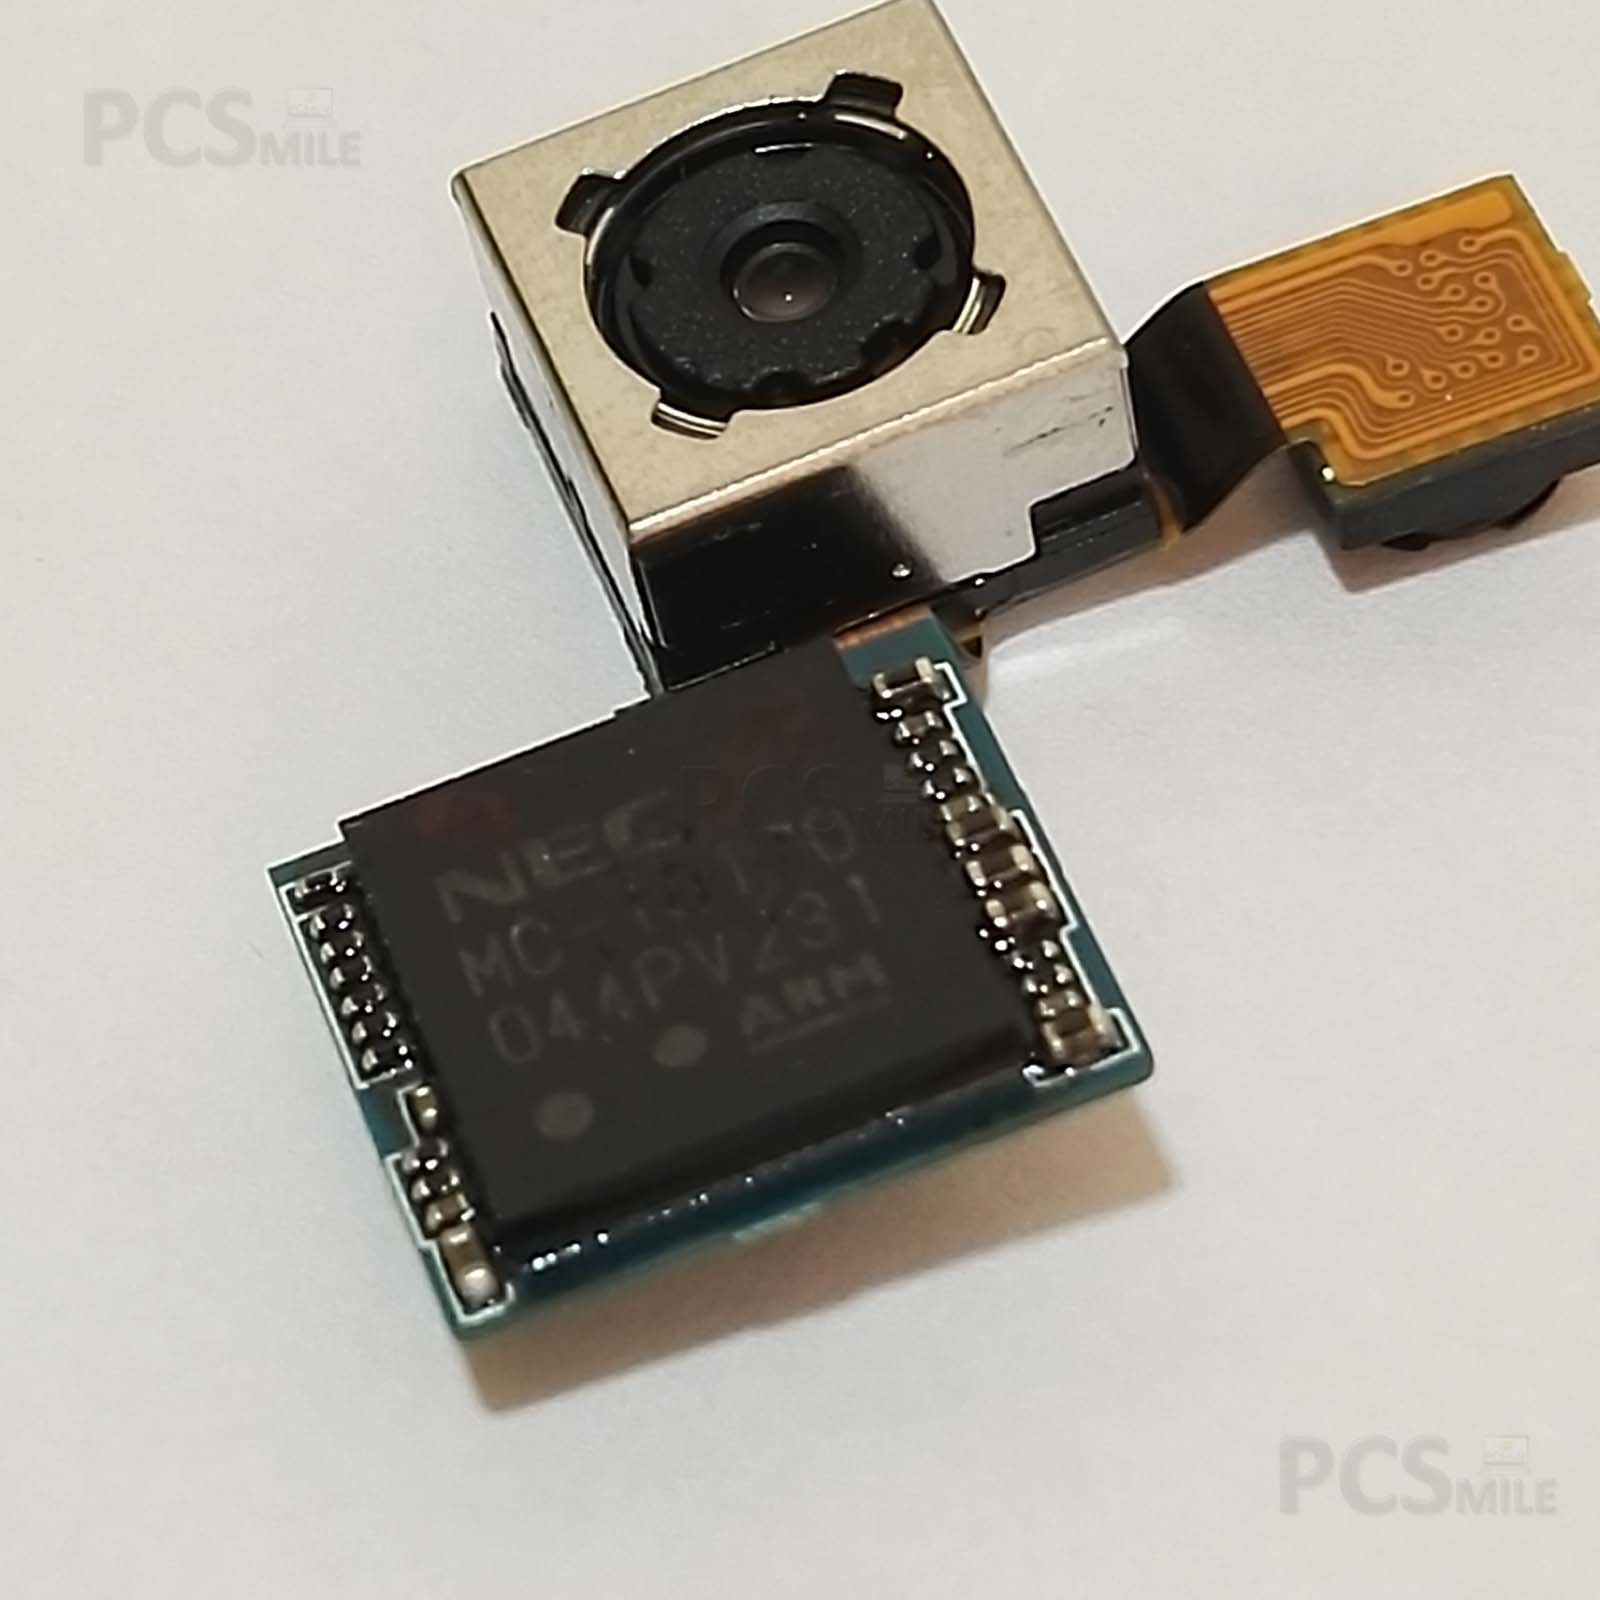 Fotocamera principale e secondaria originale Samsung Galaxy S GT-I9000 camera